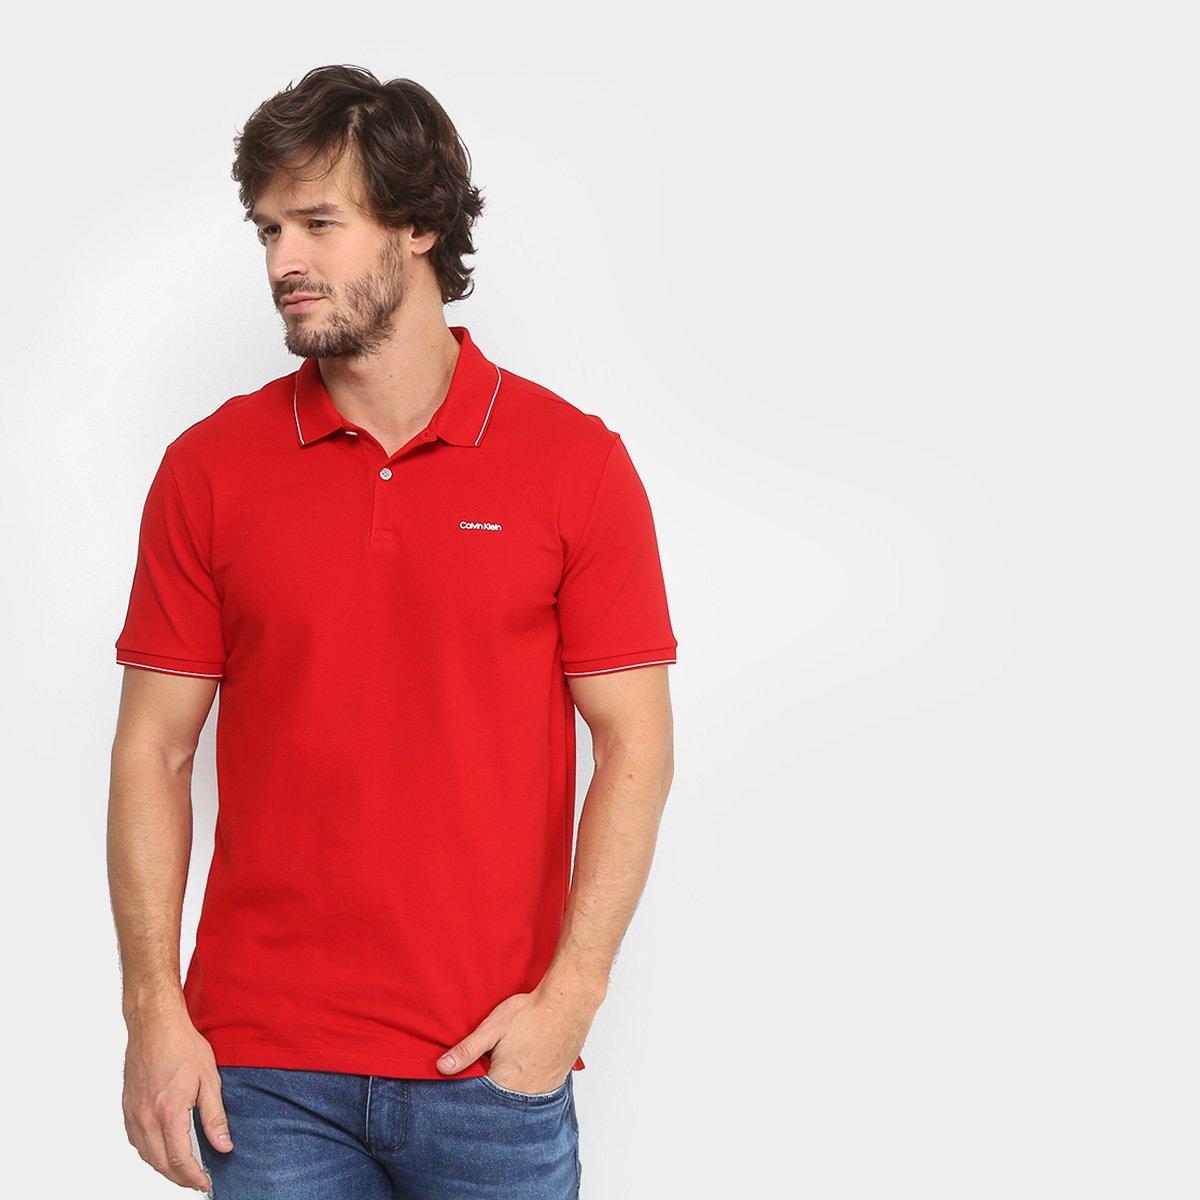 18fdadb33f Camisa Polo Calvin Klein Slim Masculina